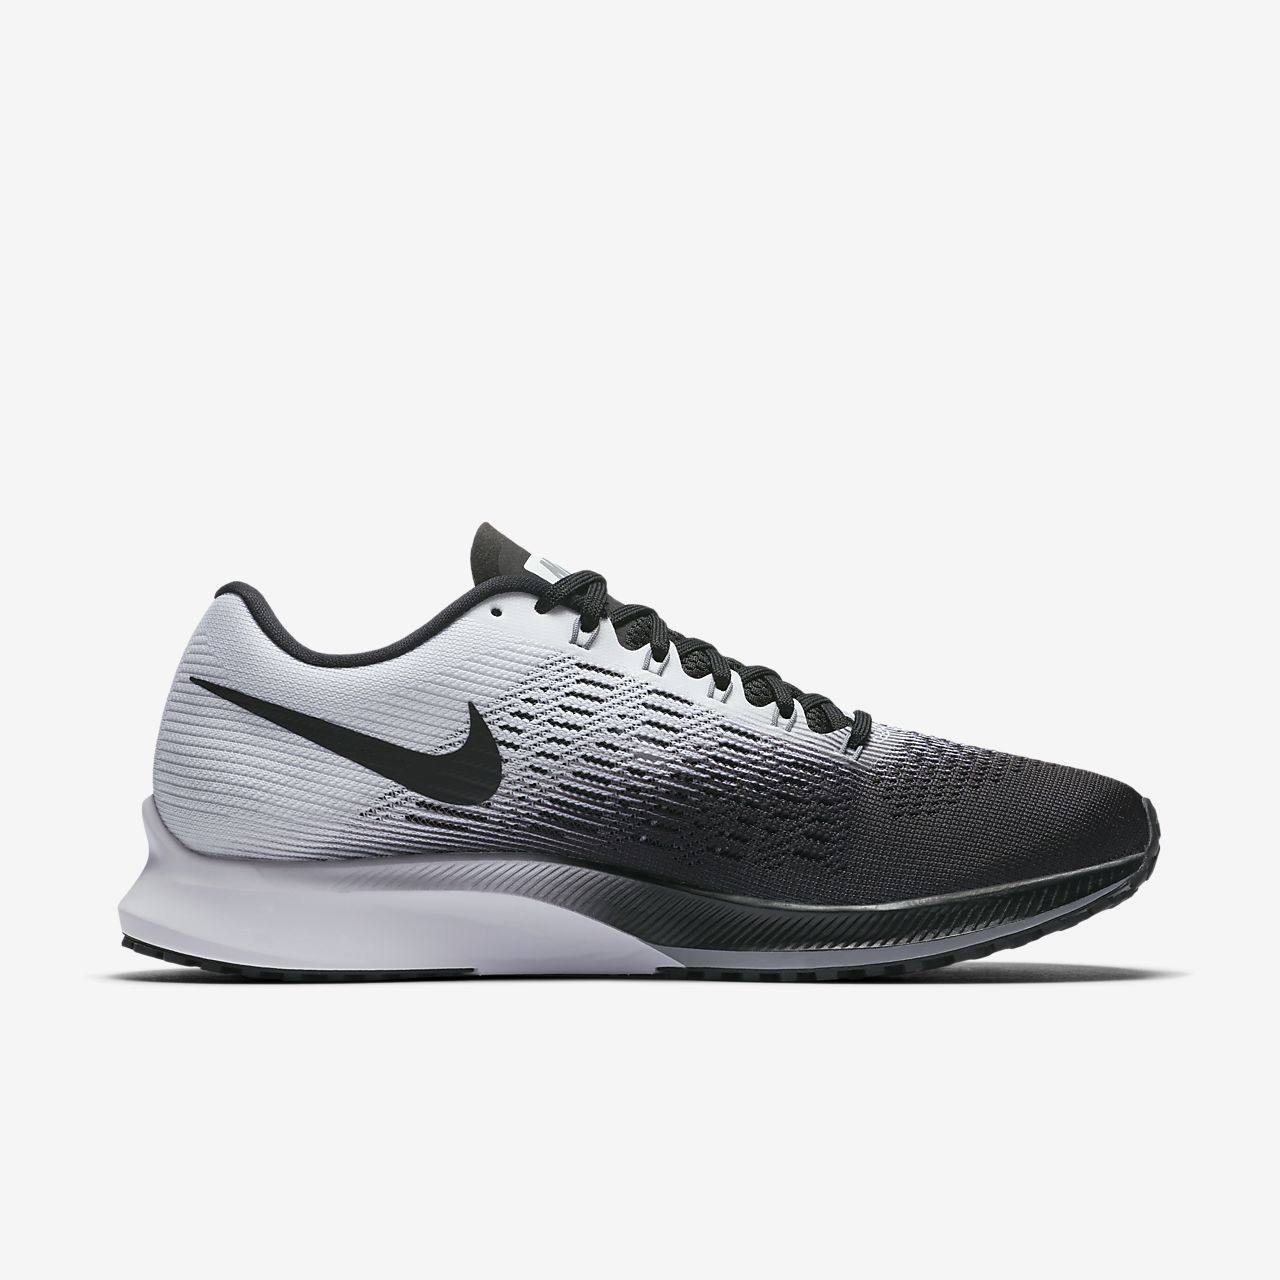 huge discount f3ae4 98a2c Nike Pegasus 27 Women 9 | Parallax Inc